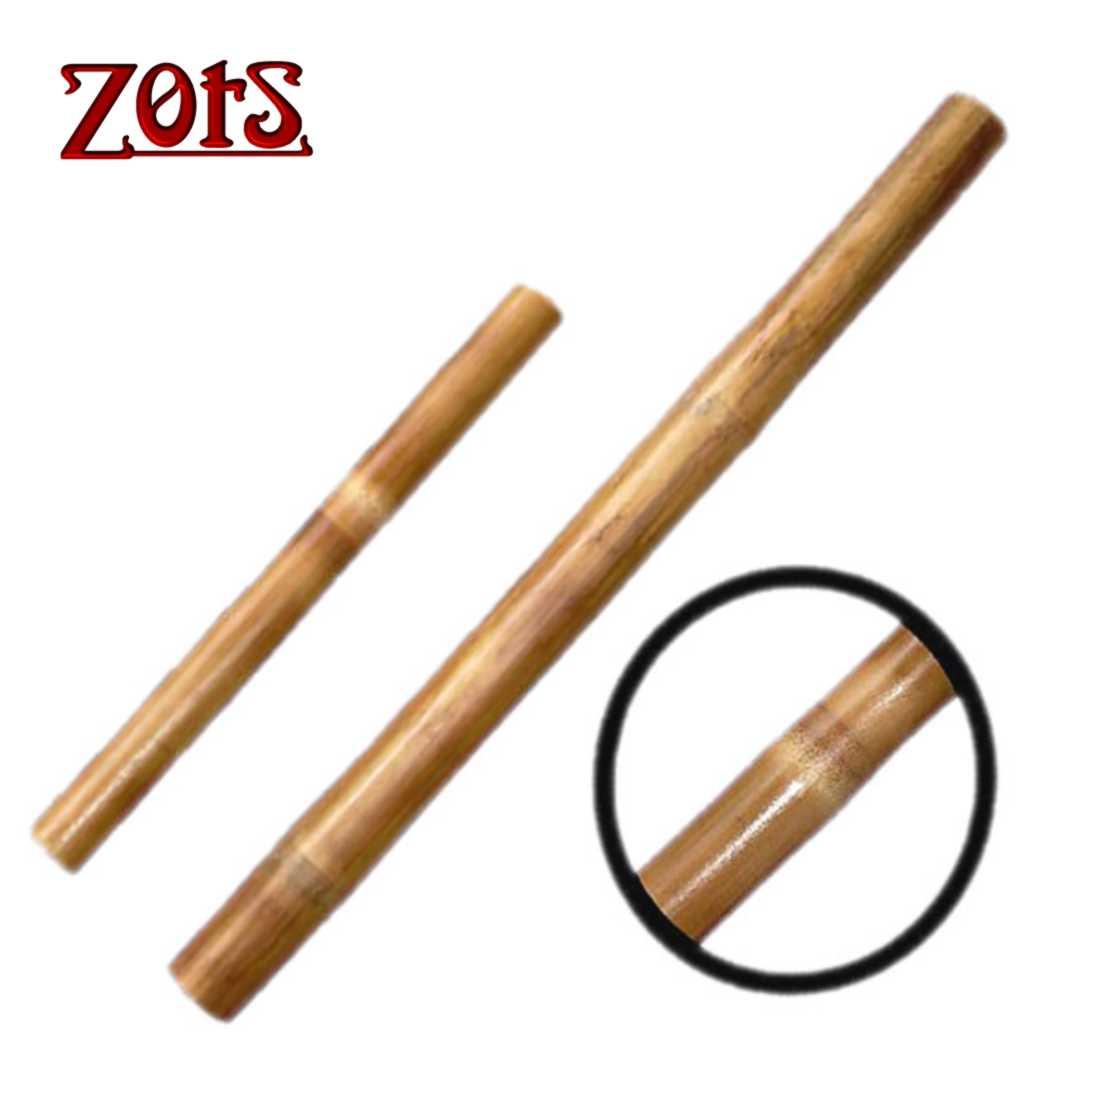 Bambu 50 cm  -  Zots